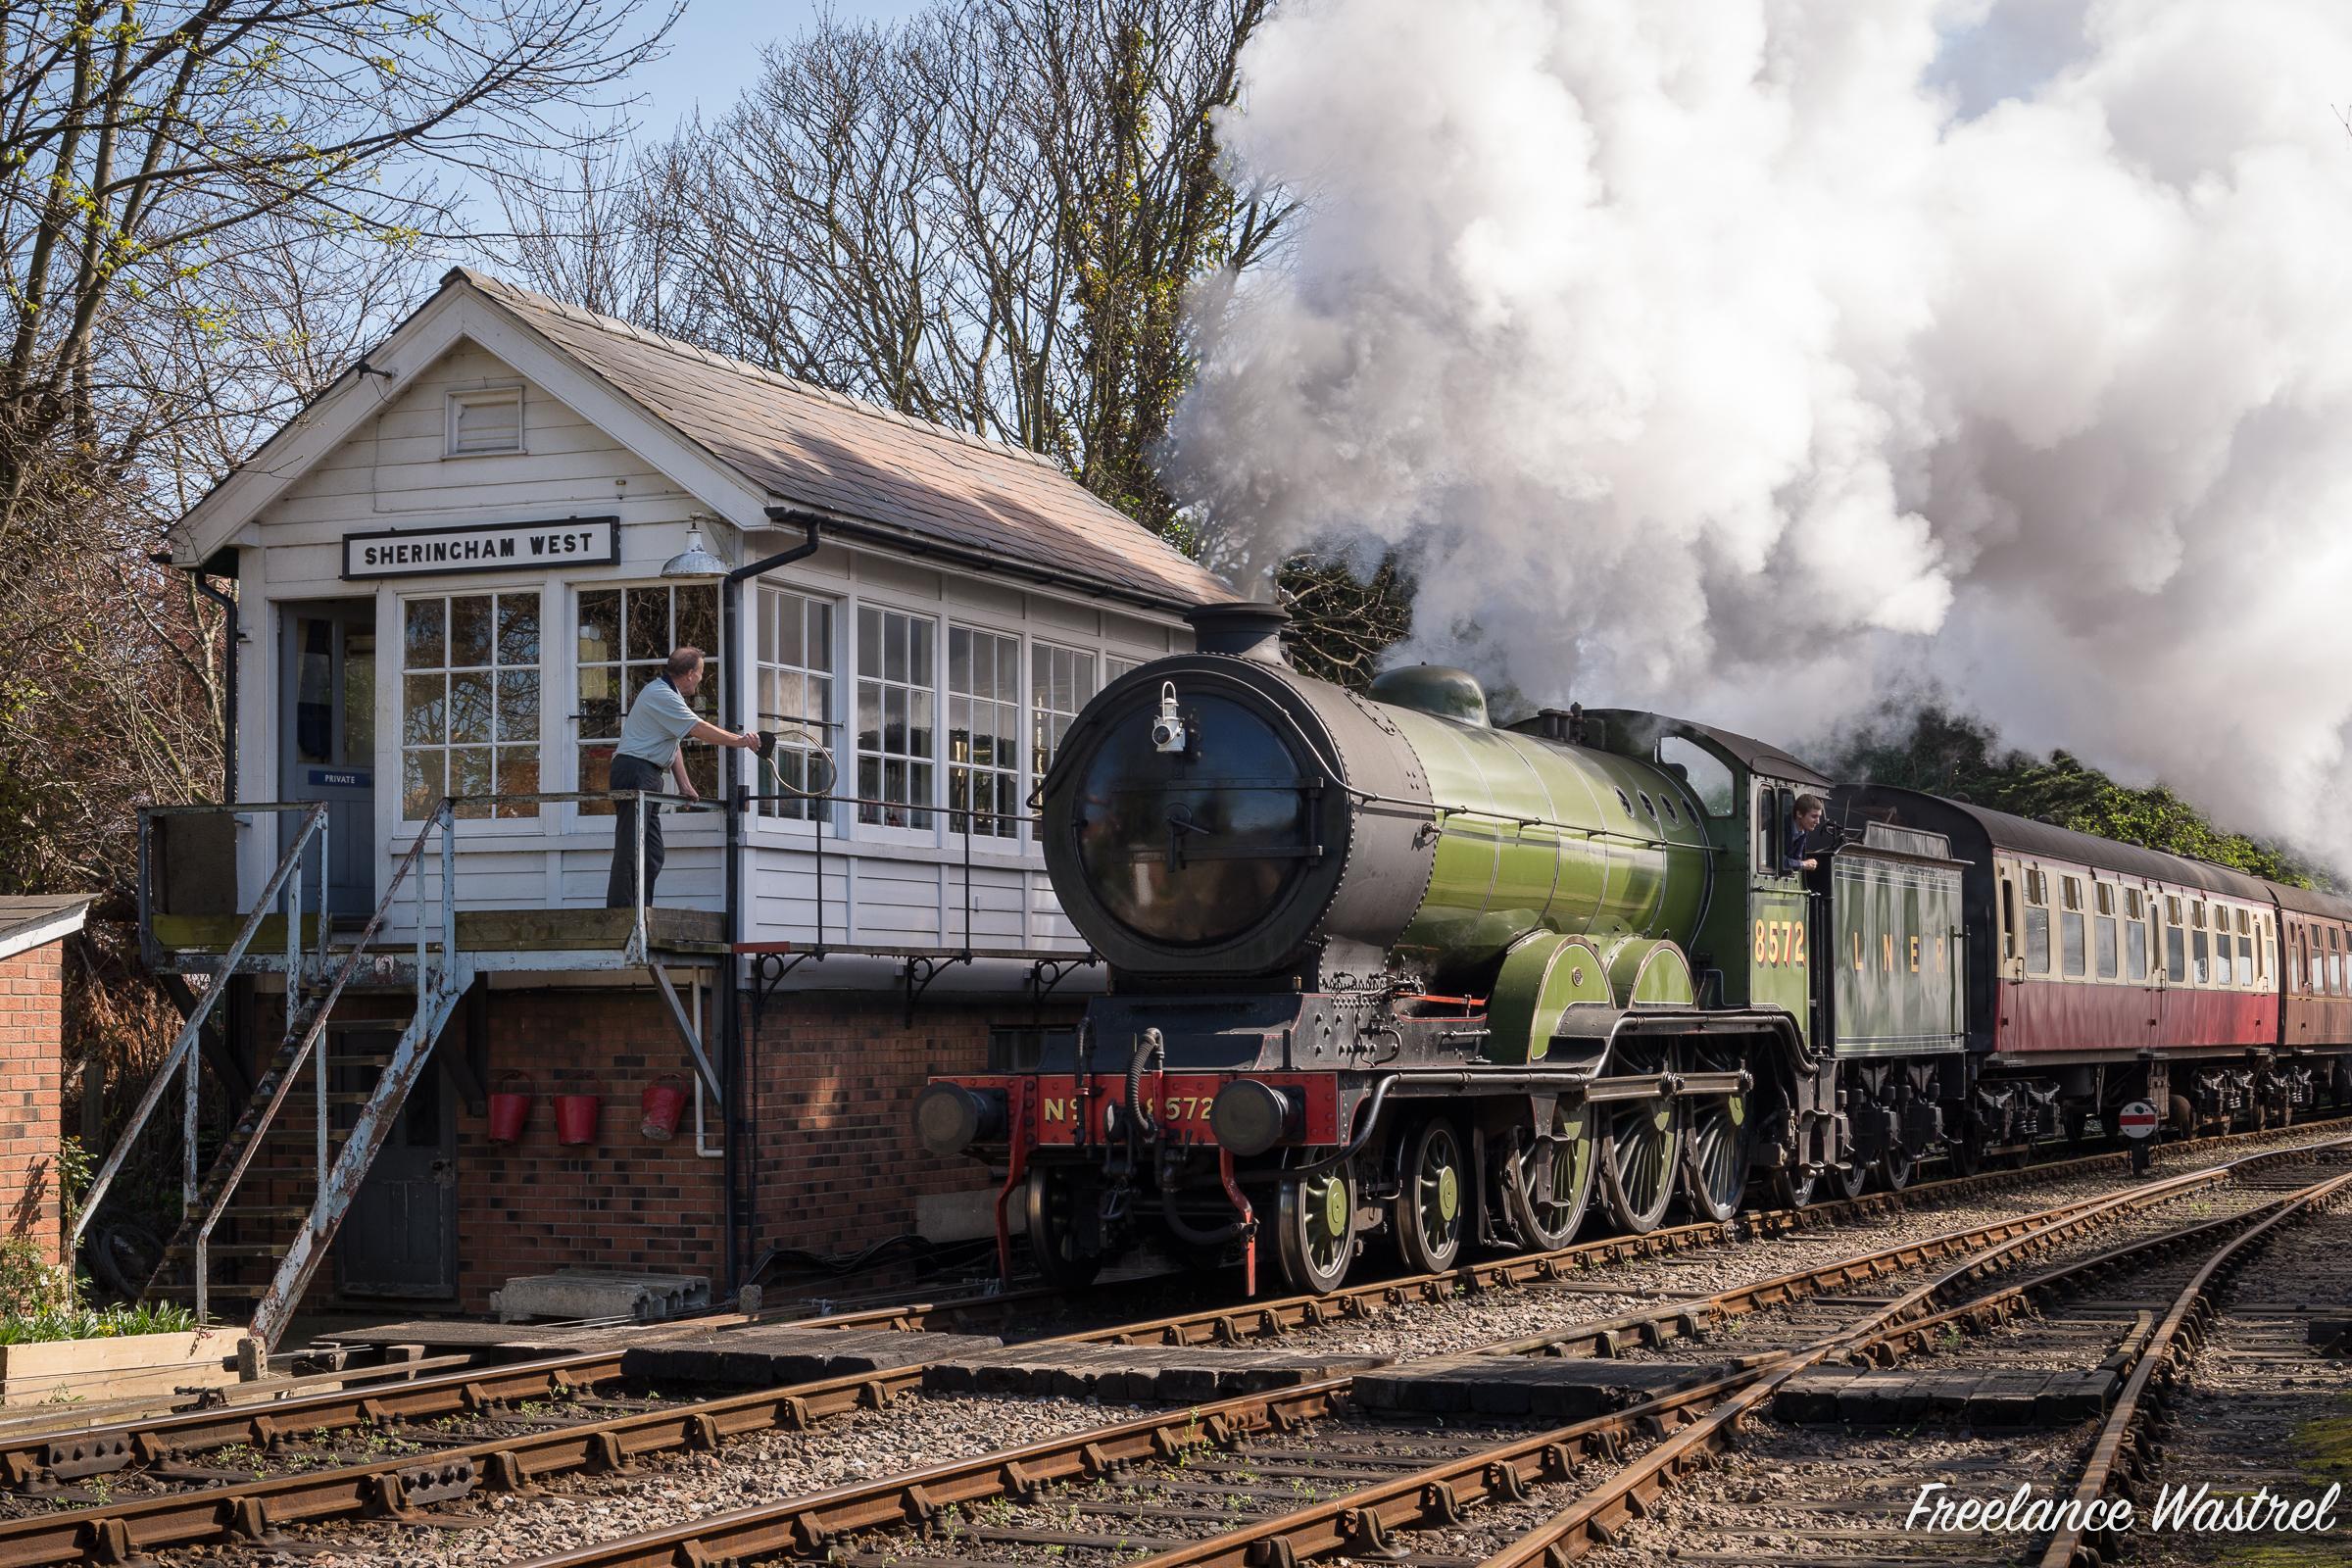 LNER class B12 4-6-0 8572